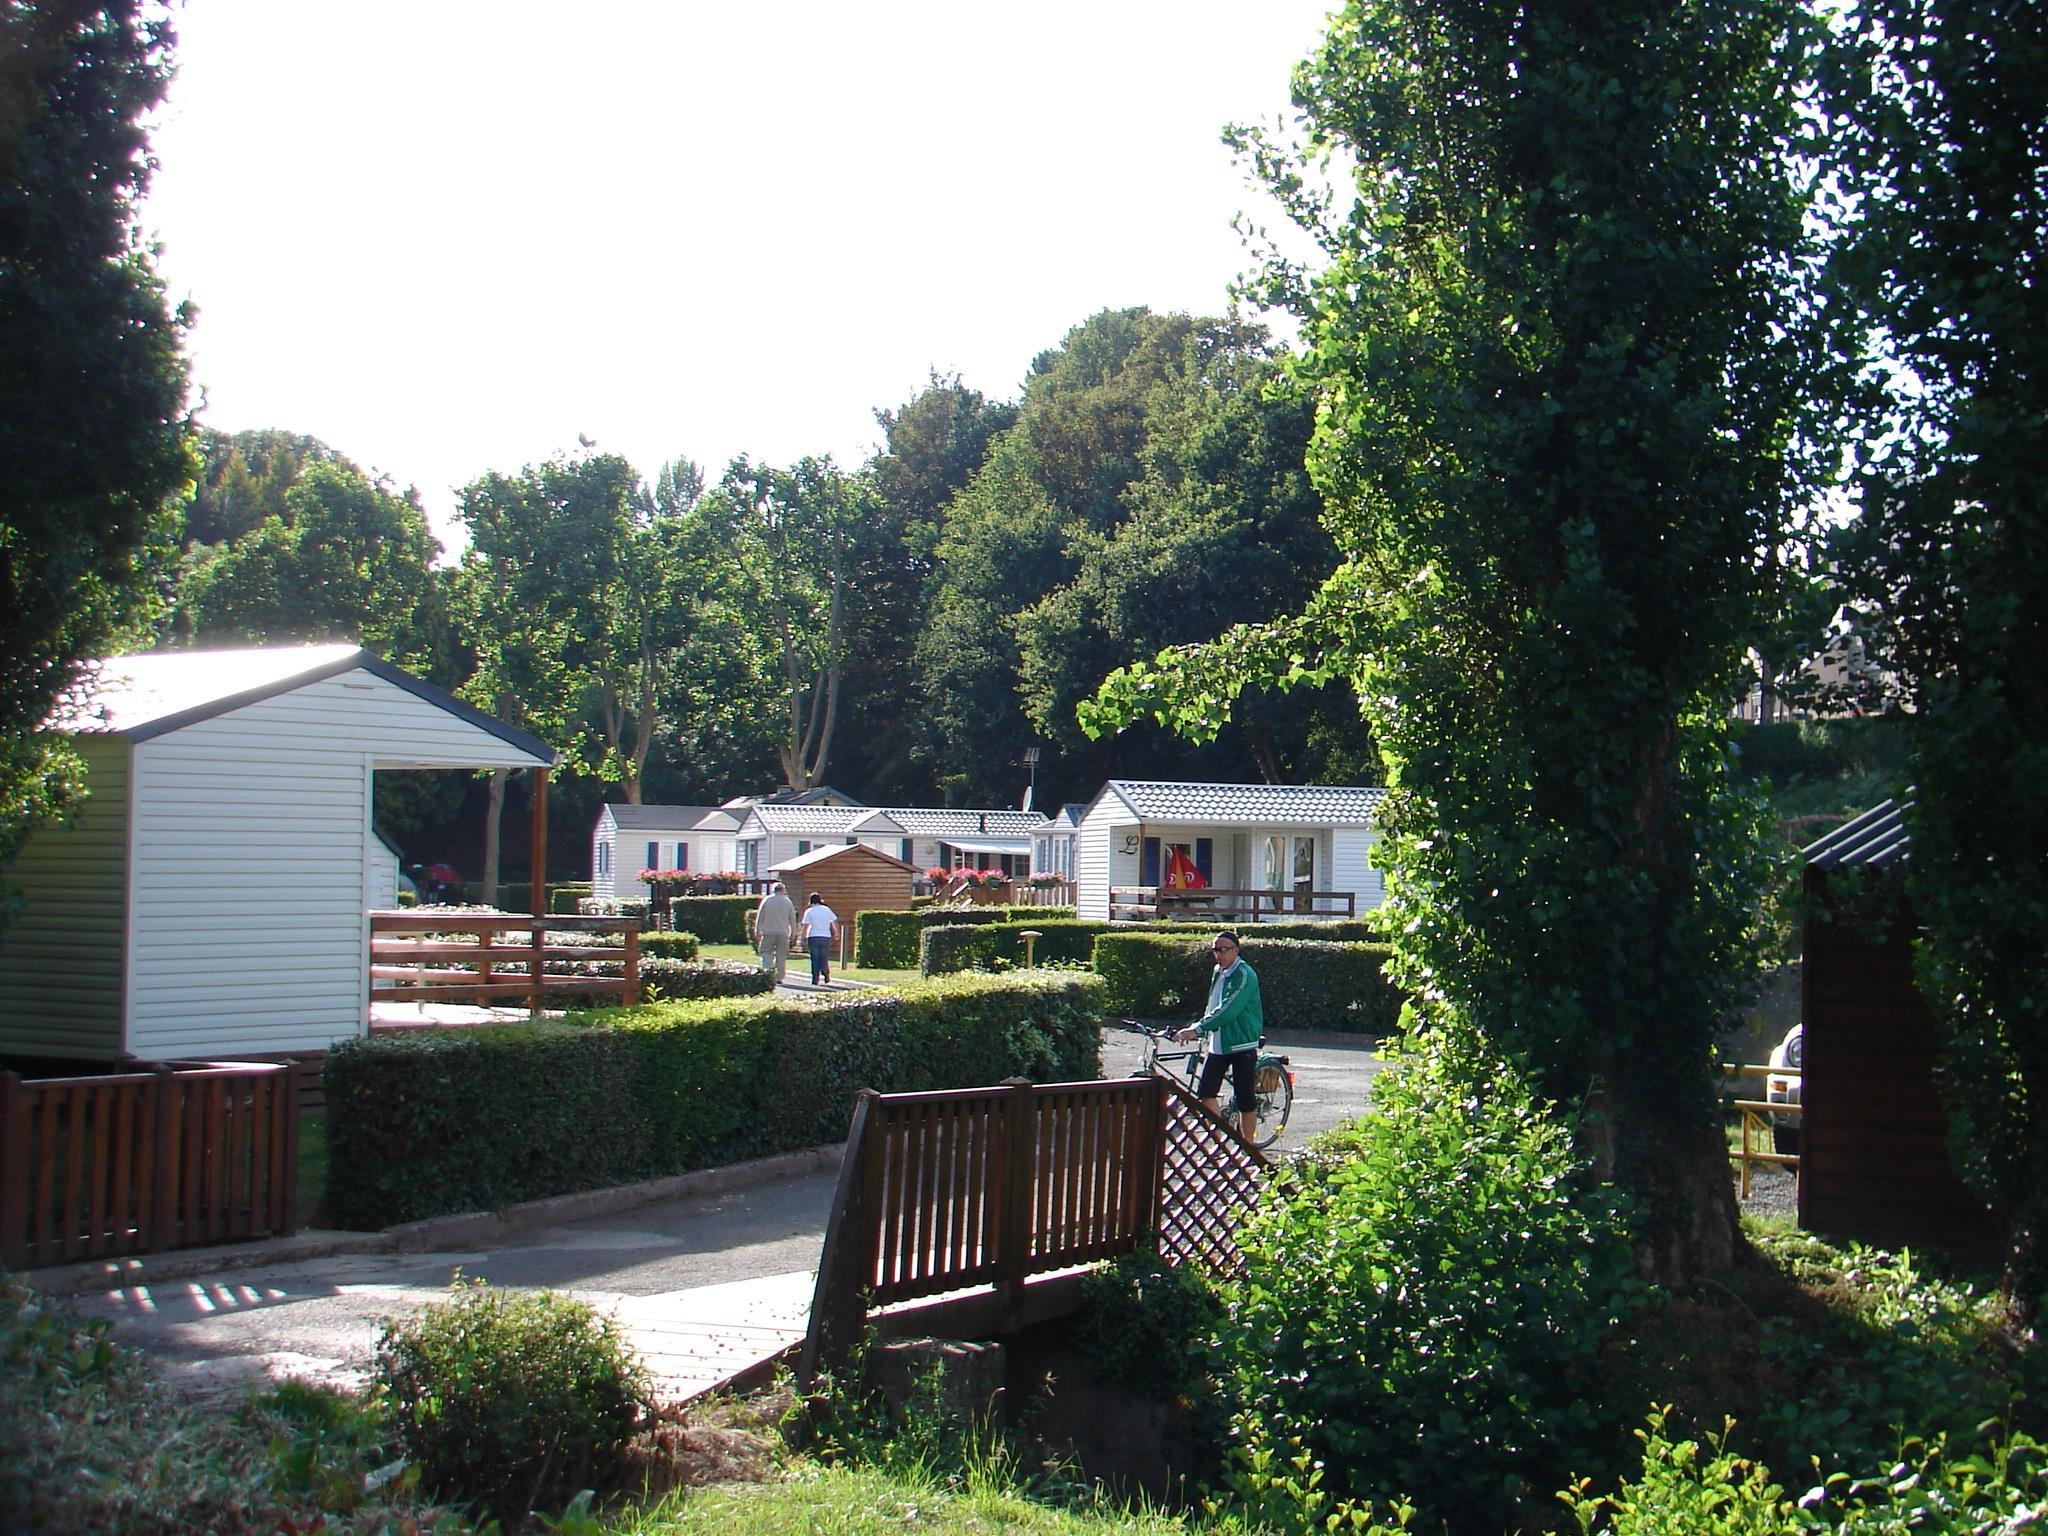 Camping des Vallées, Saint-Brieuc, Côtes-d'Armor